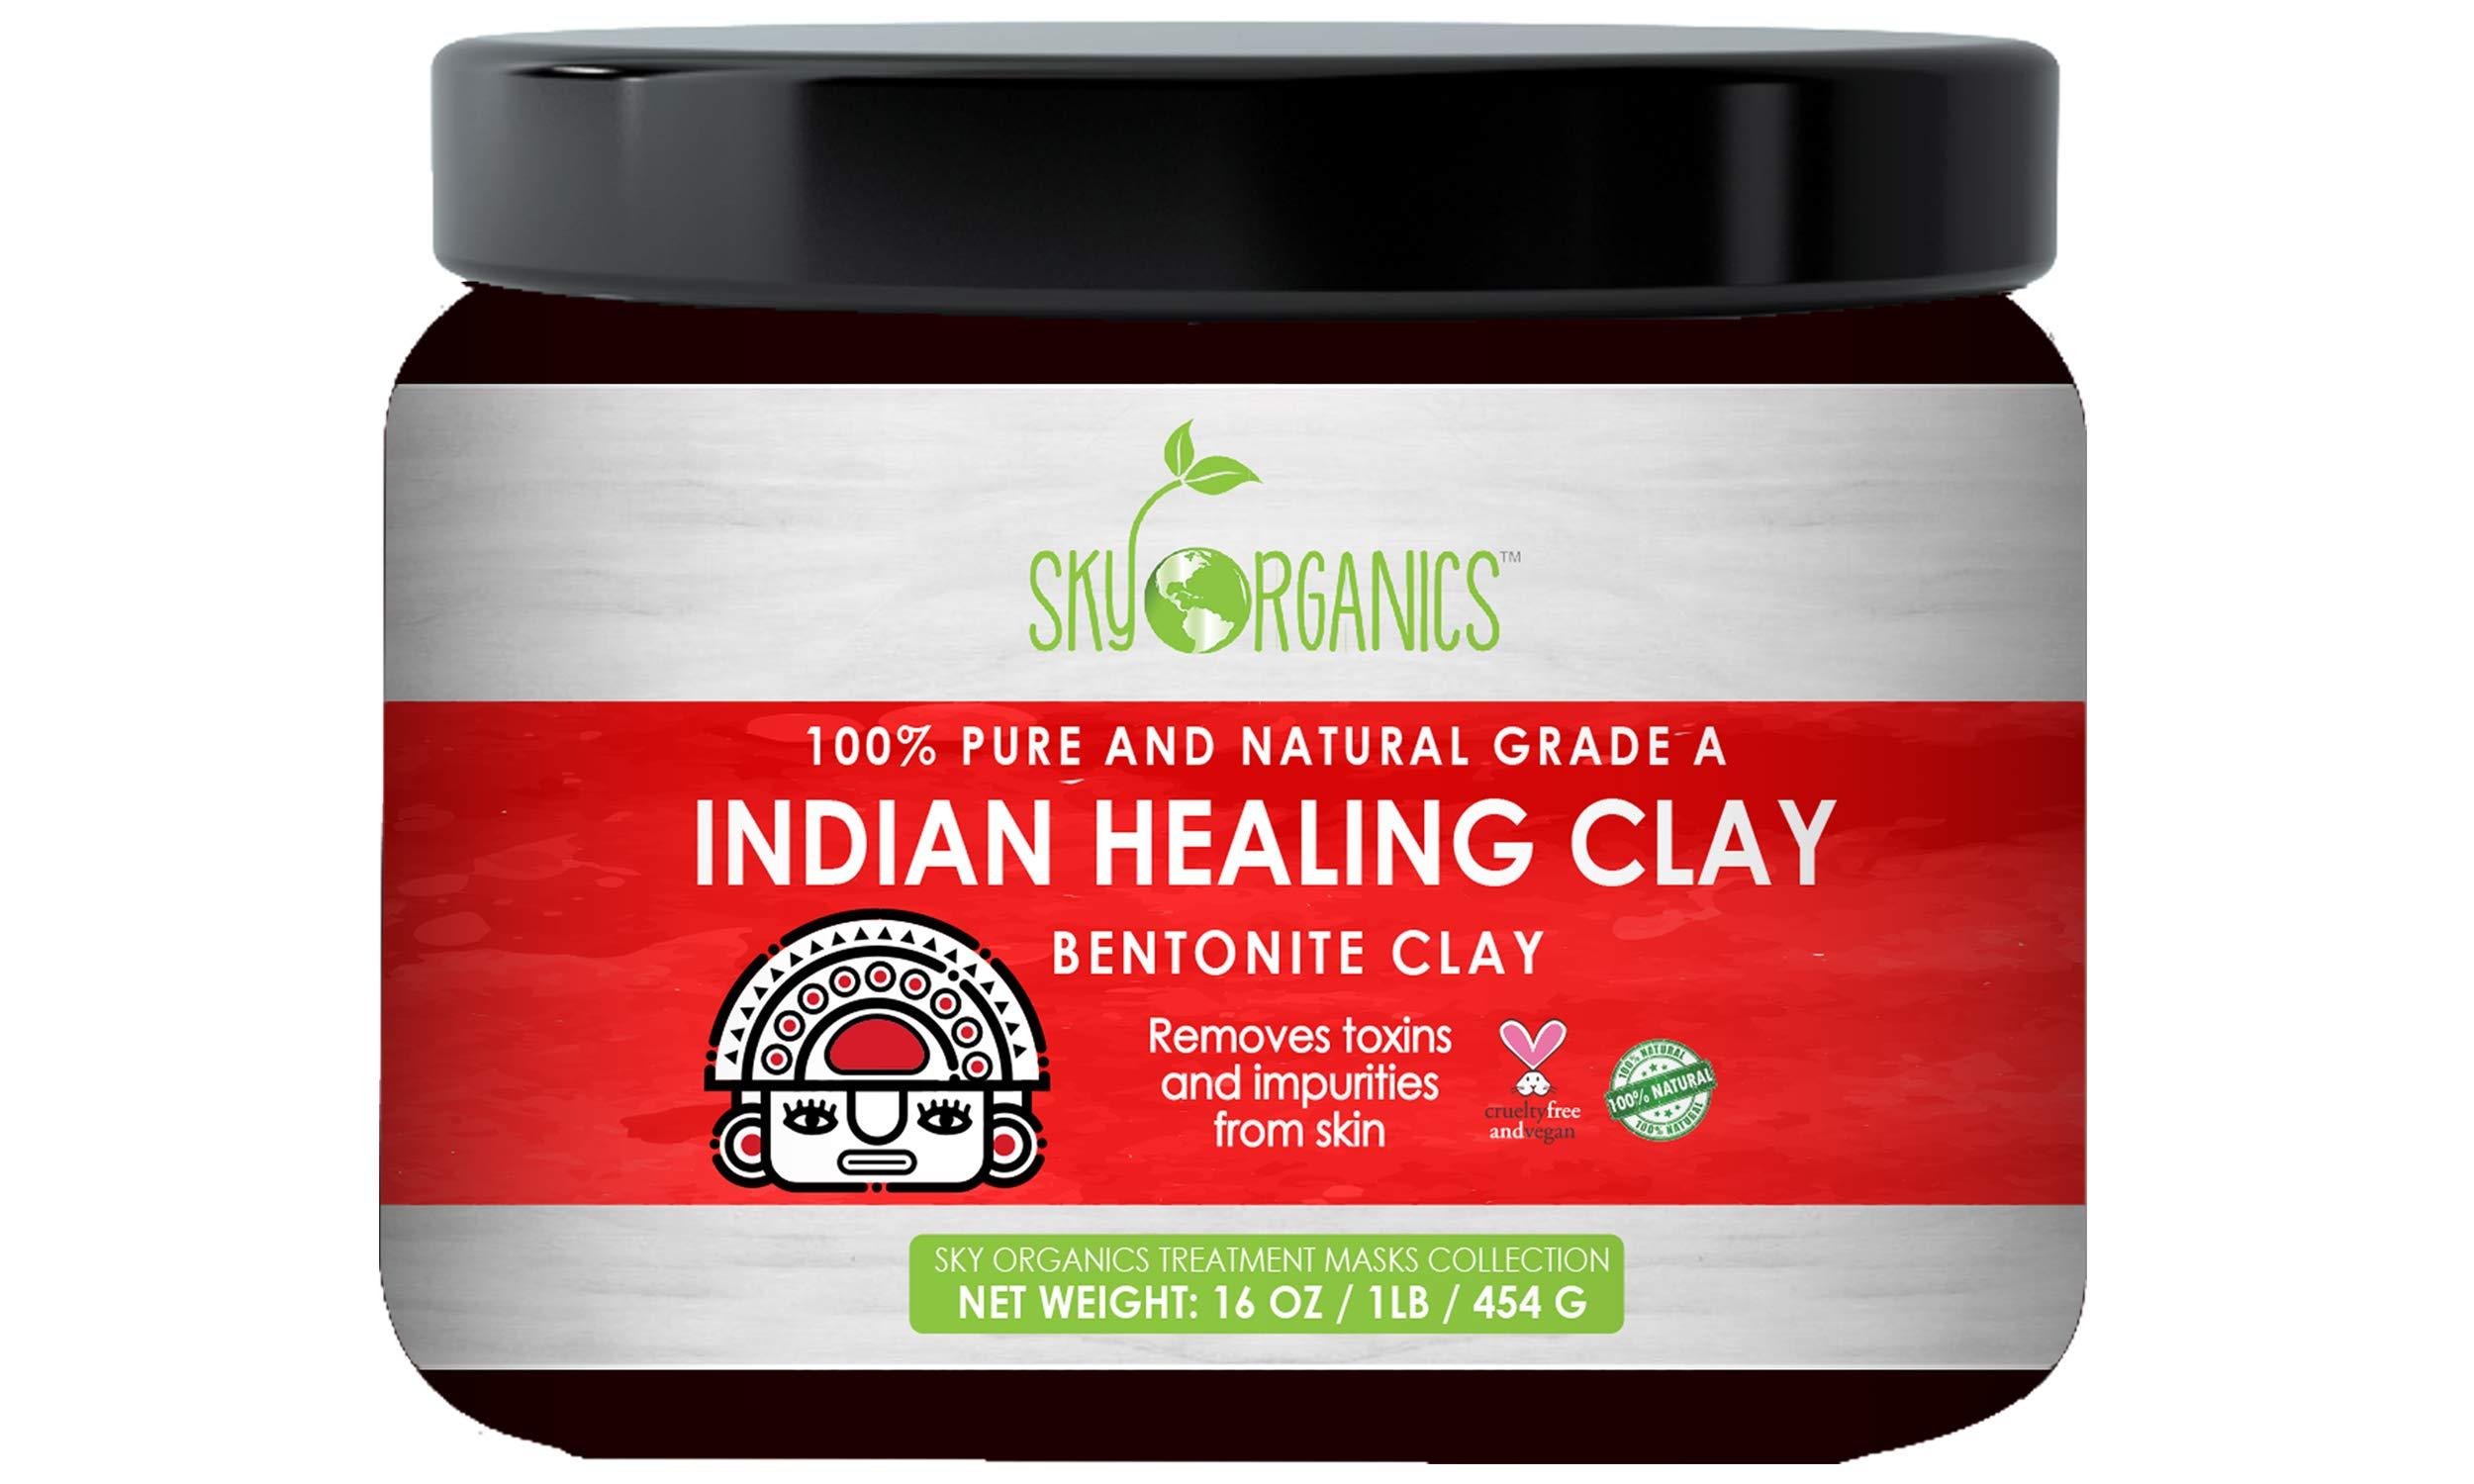 bf9dc77120e31 Amazon.com : Indian Healing Clay 16oz -100% Pure & Natural Bentonite ...